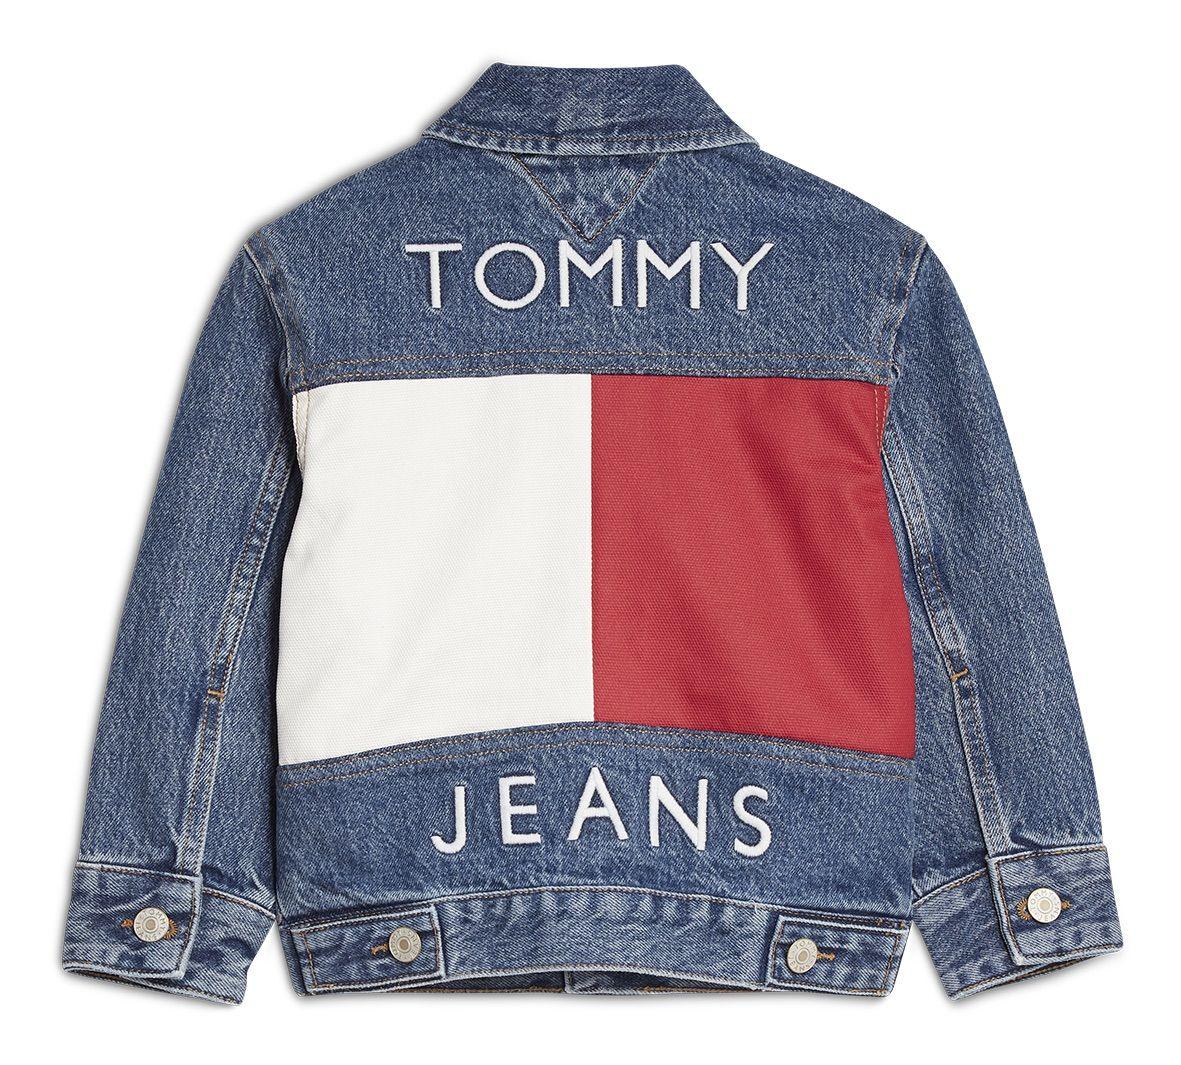 The Iconic Tommyjeans Jacket Now In Miniature Kids Denim Jacket Tommy Jeans Unisex Jacket [ 1065 x 1181 Pixel ]